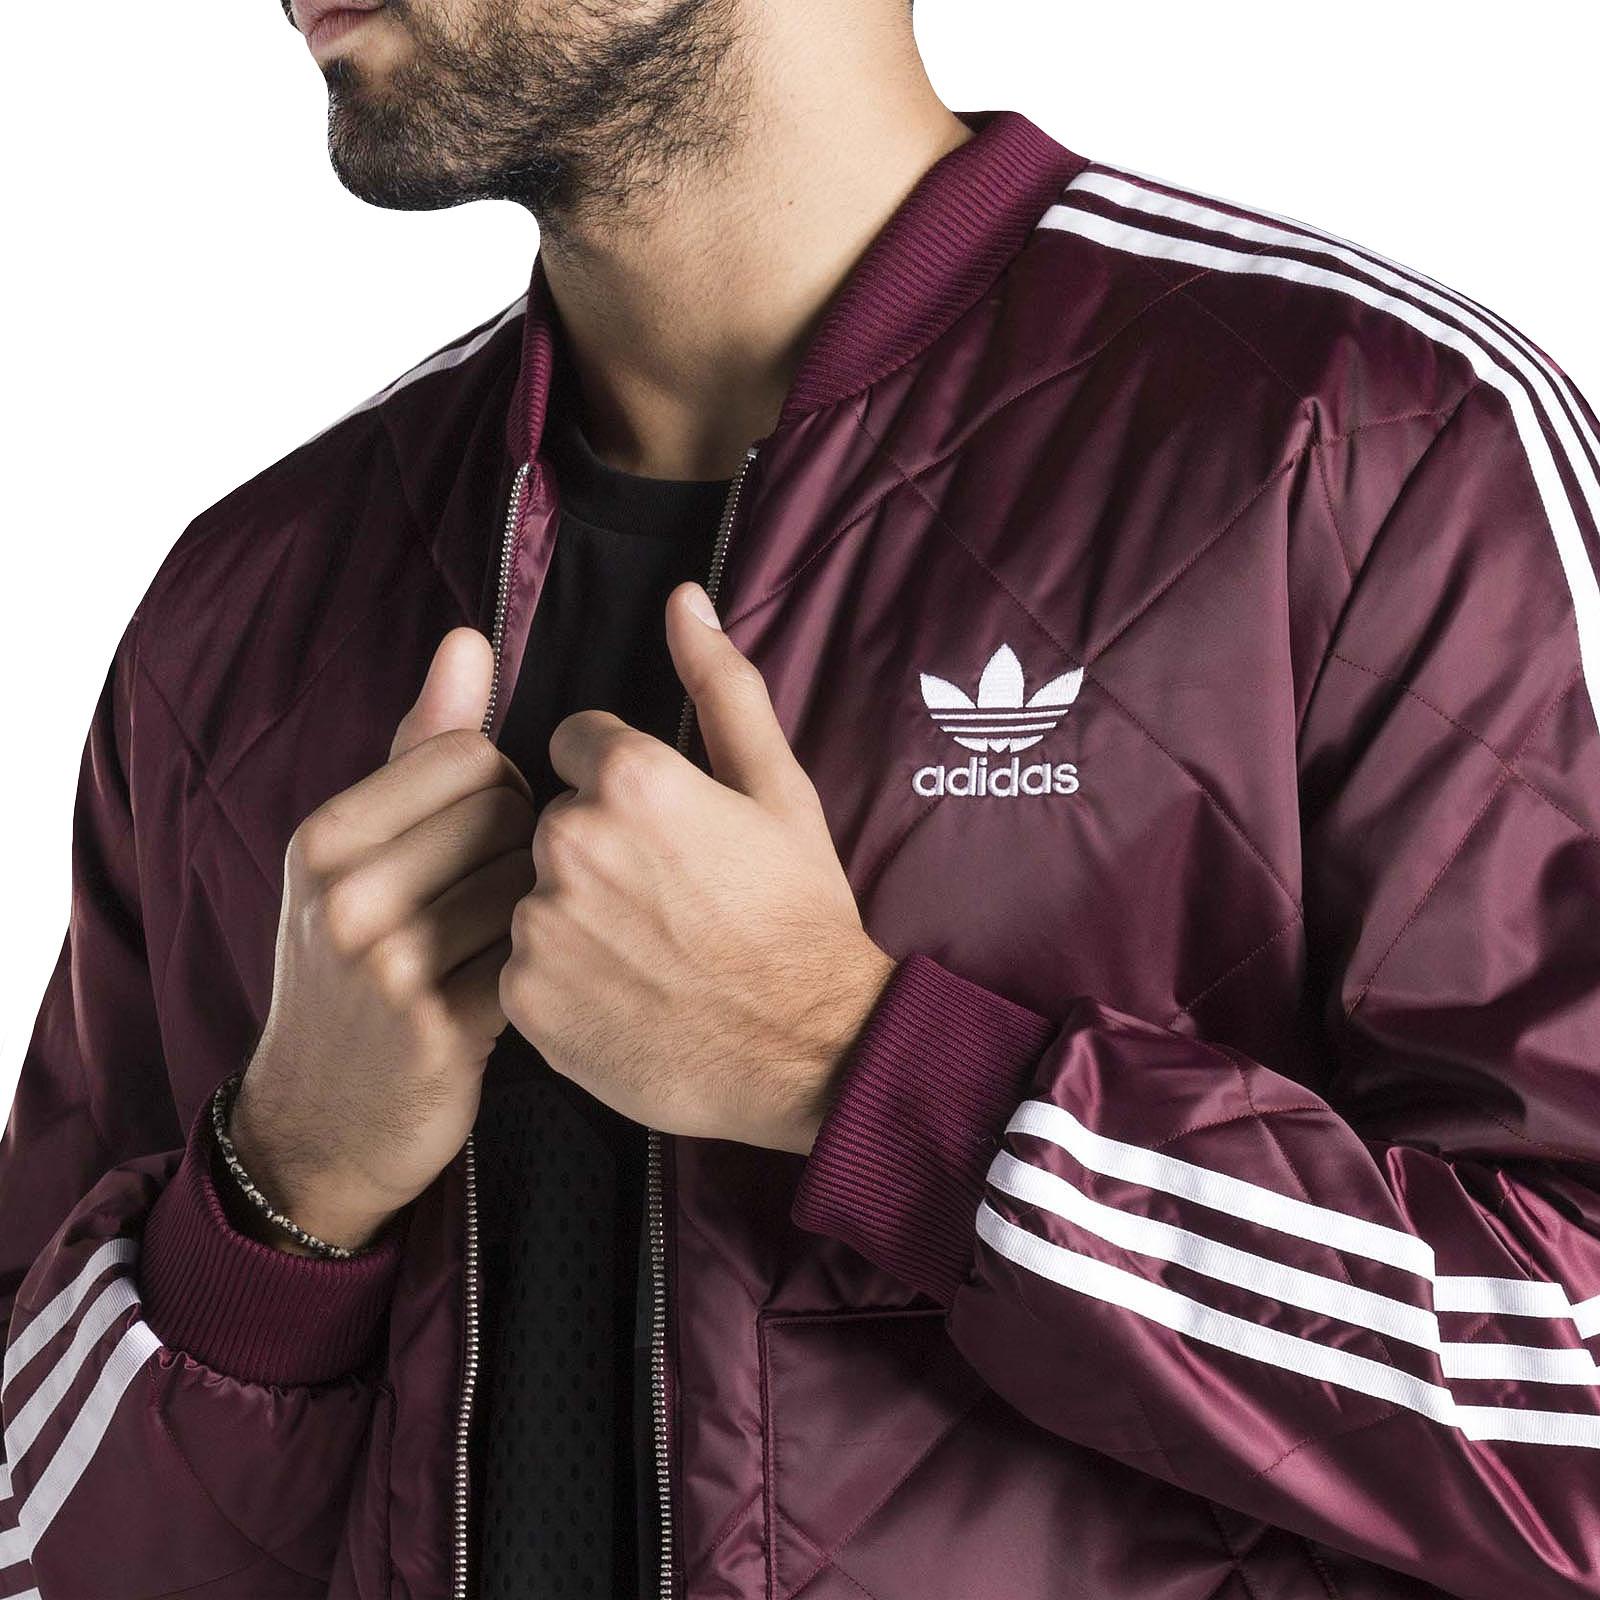 ADIDAS ORIGINALS MENS Superstar Quilted Zipped Long Sleeve ...